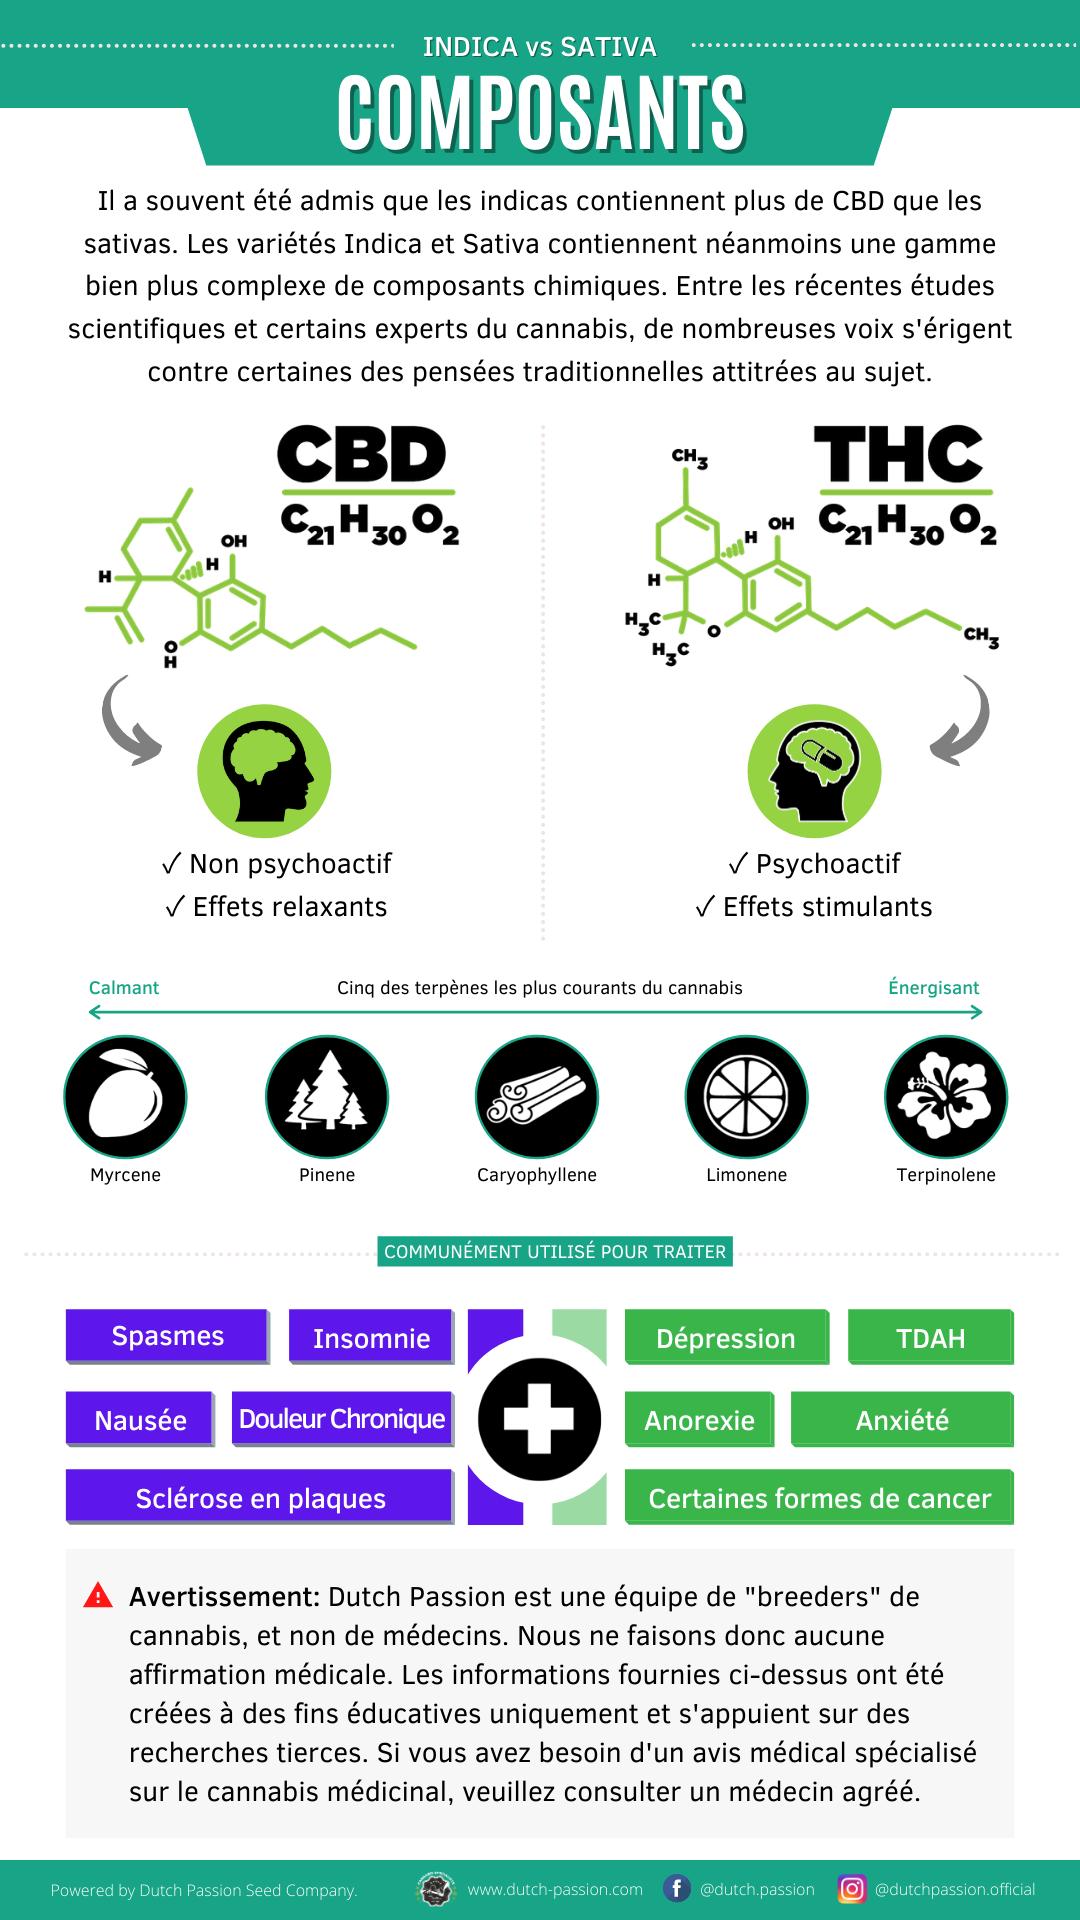 Indica vs Sativa Composants